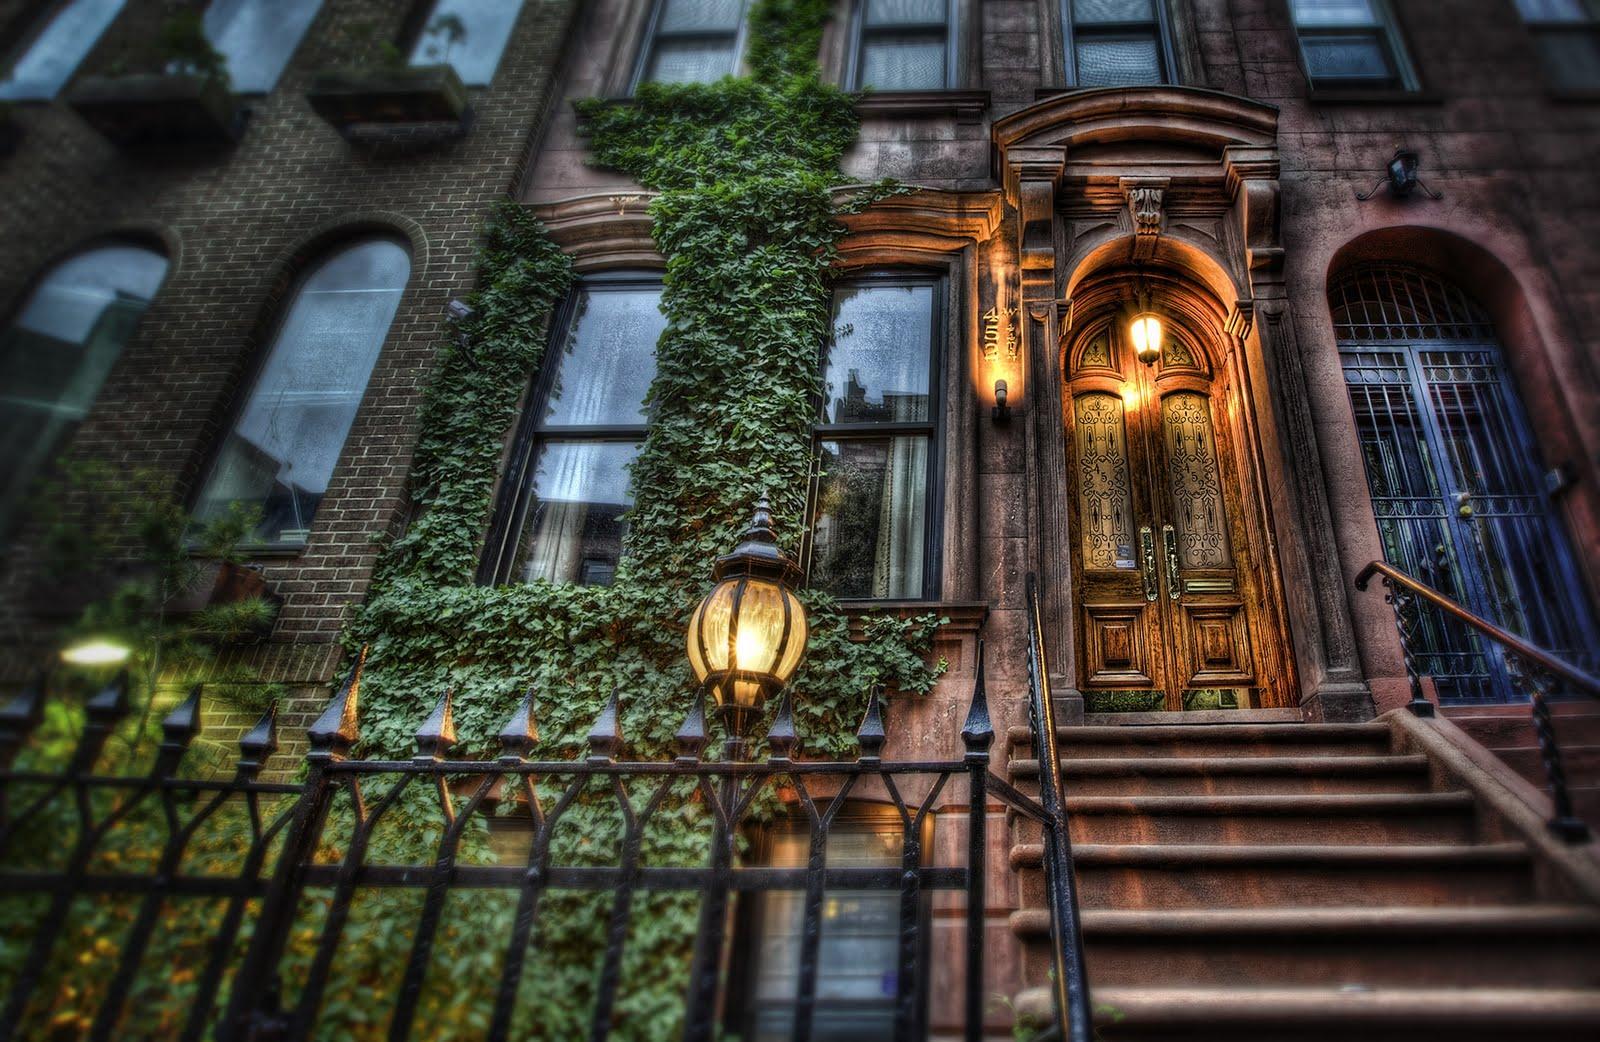 Hells Kitchen New York images